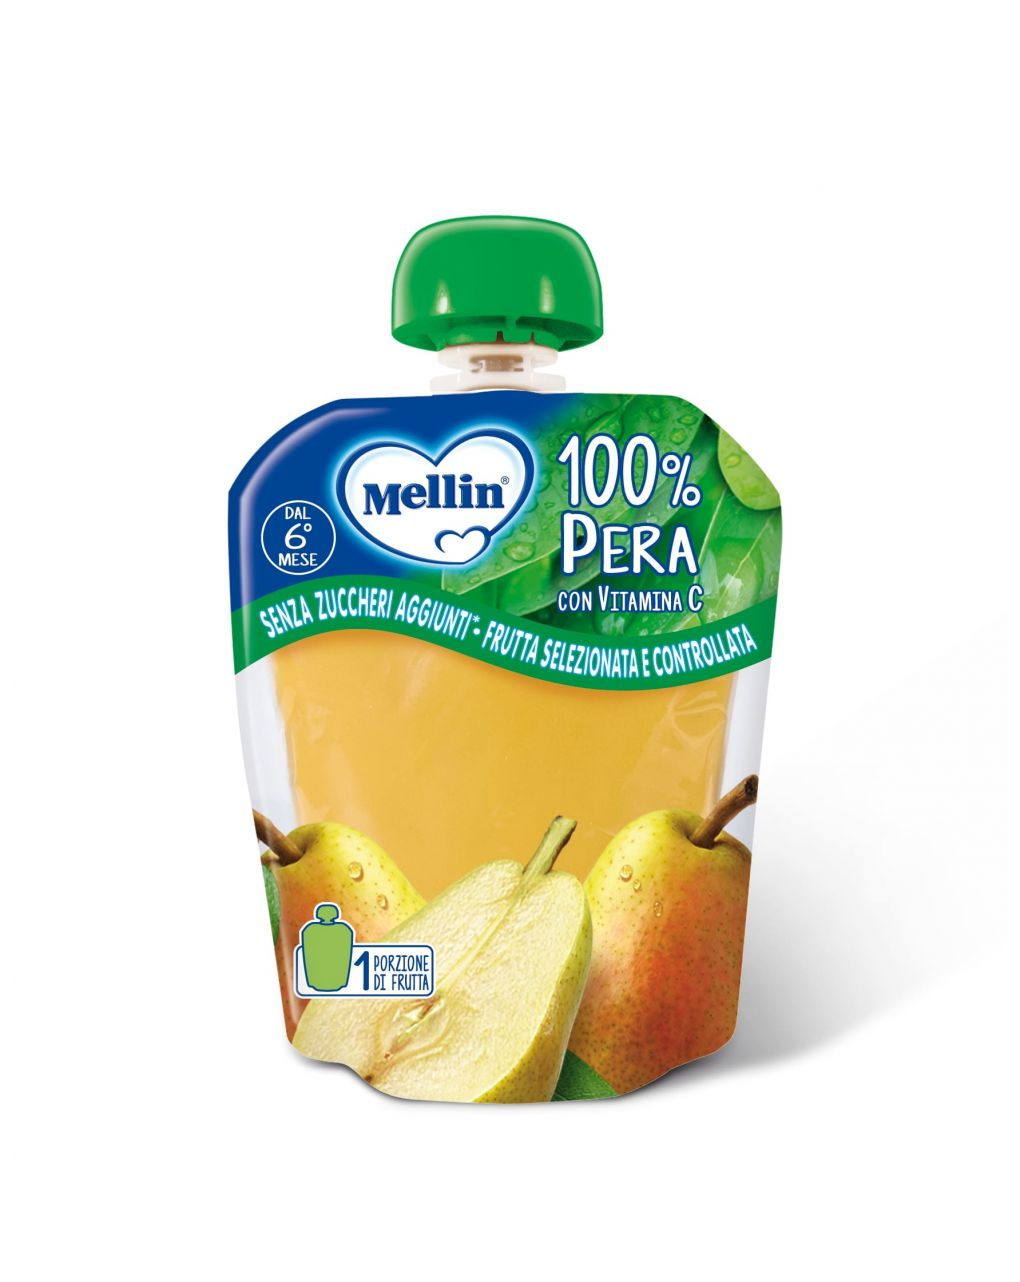 Mellin - pouch pera 90g - Mellin